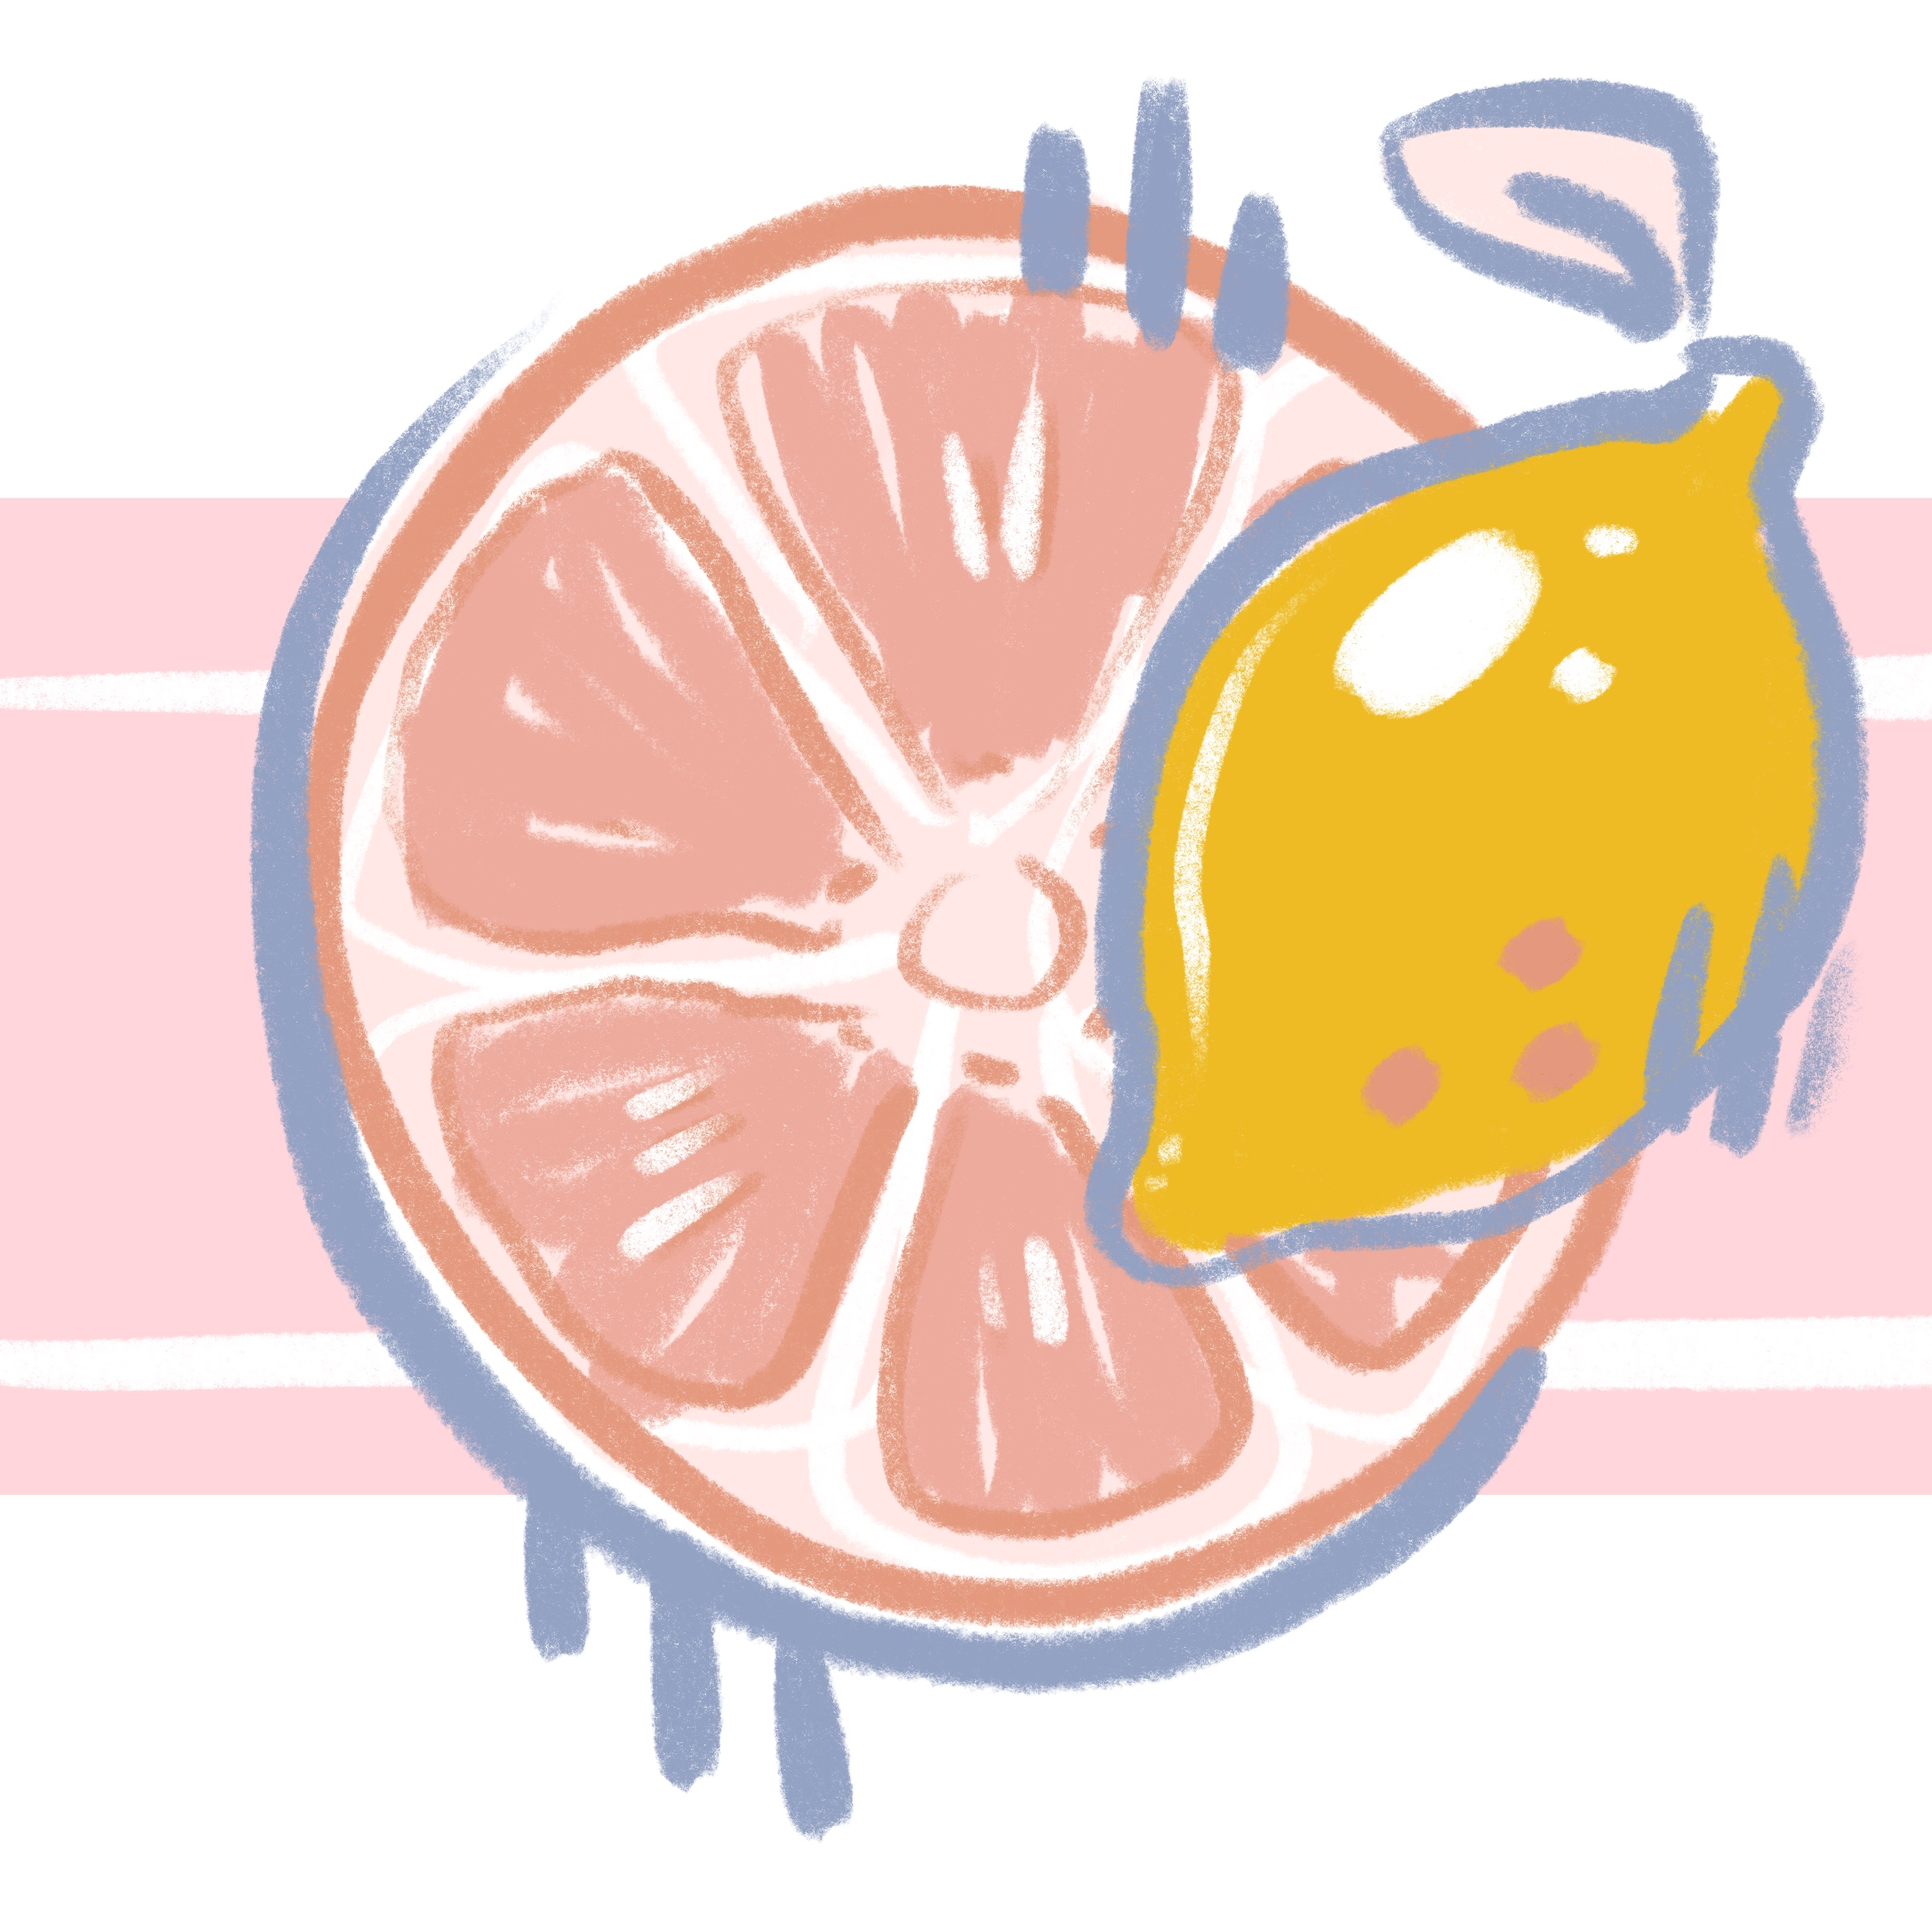 Pink and yellow Grapefruit Lemonade Label Graphic